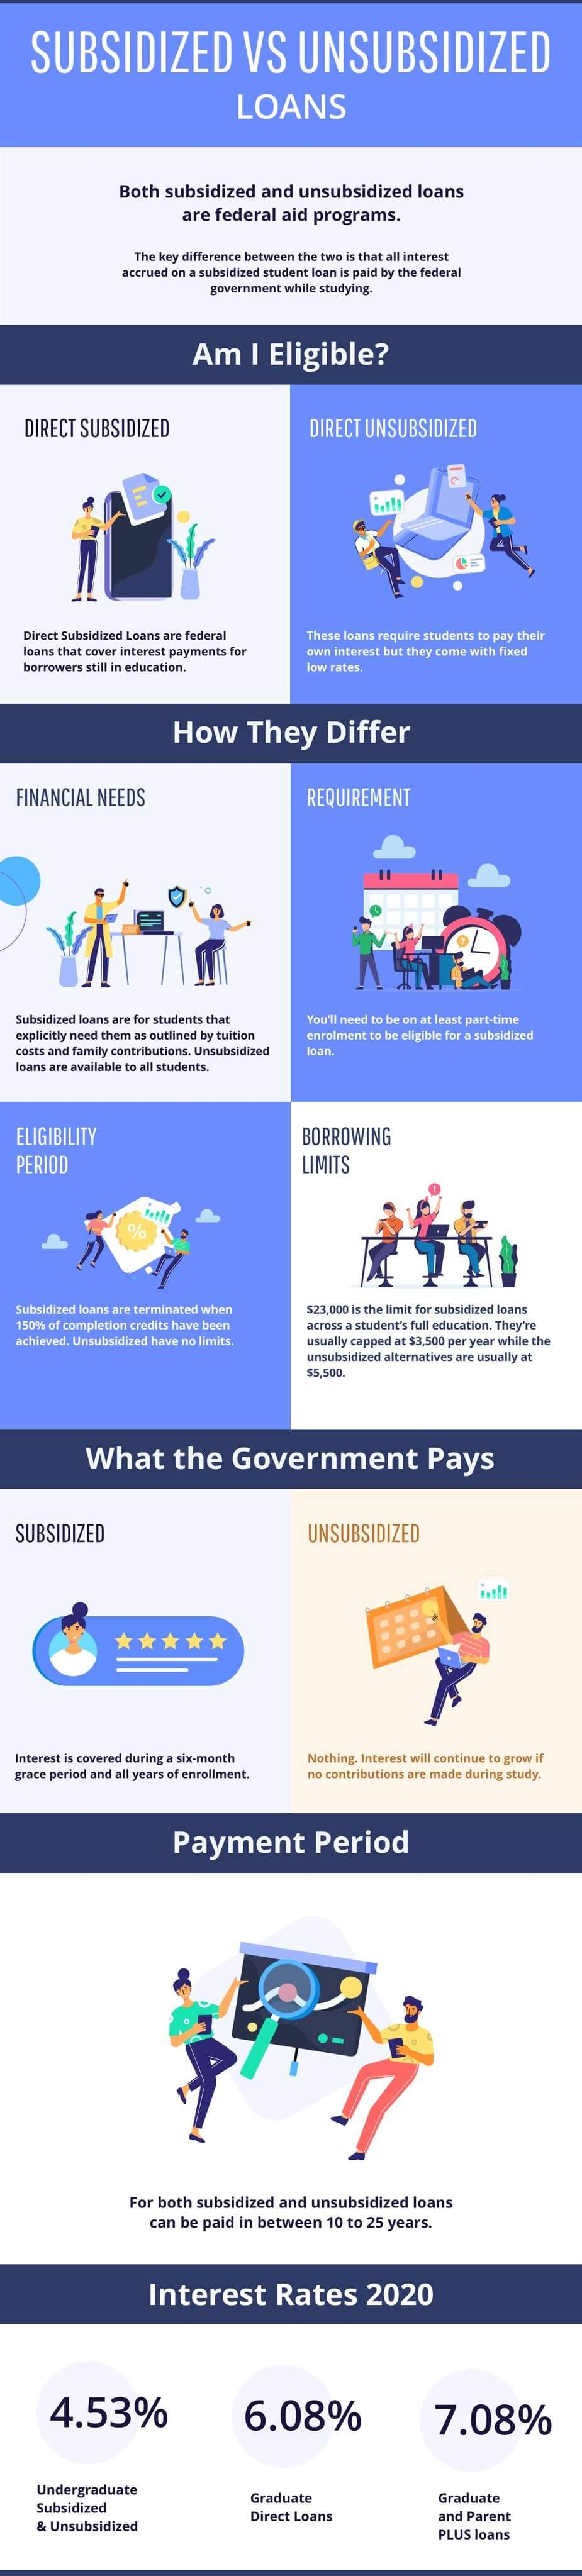 Subsidized vs Unsubsidized